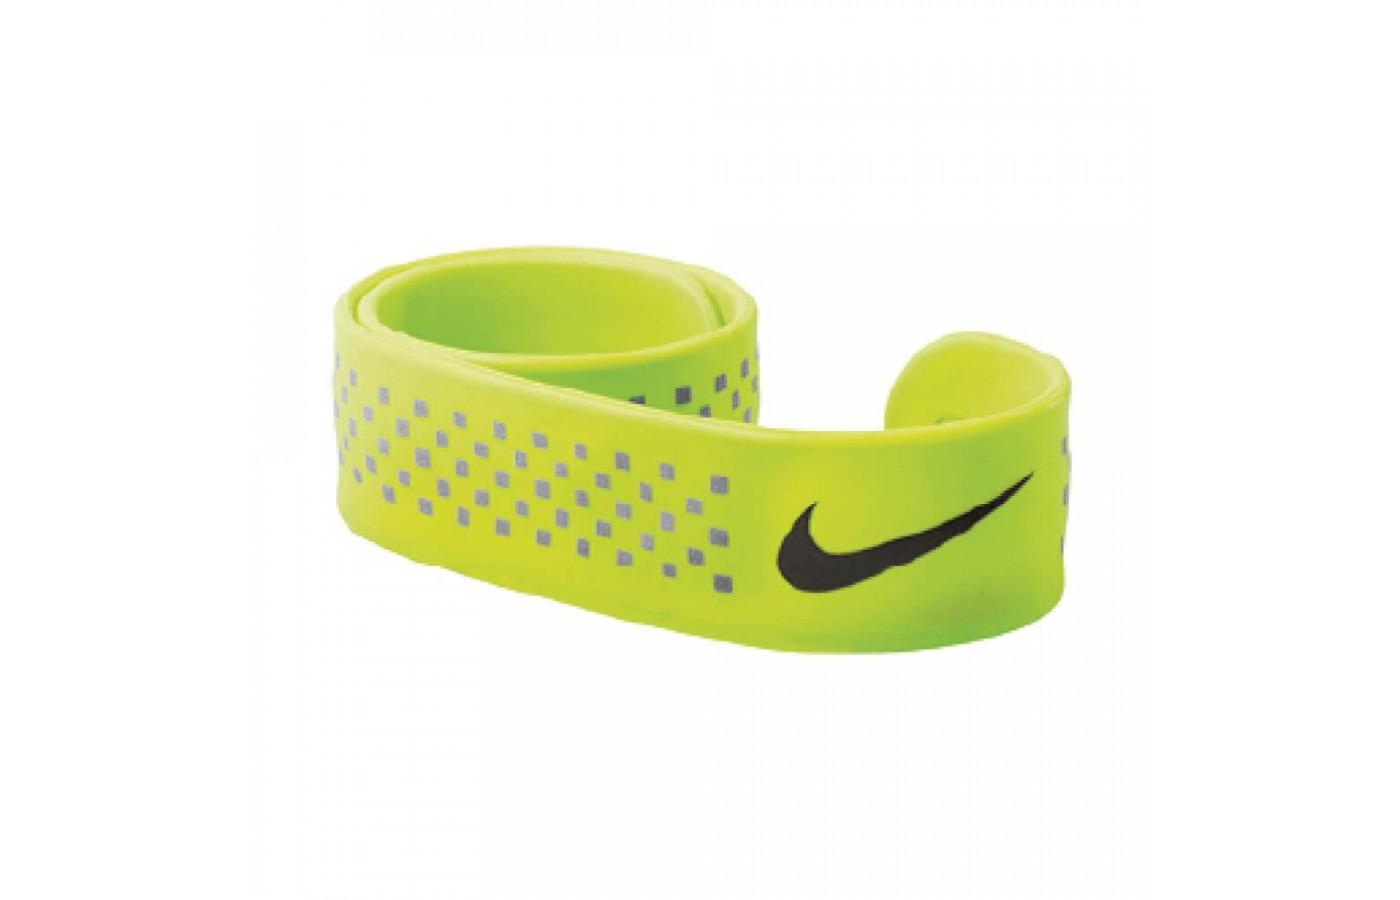 Nike Running Slap Band 2.0 Yellow